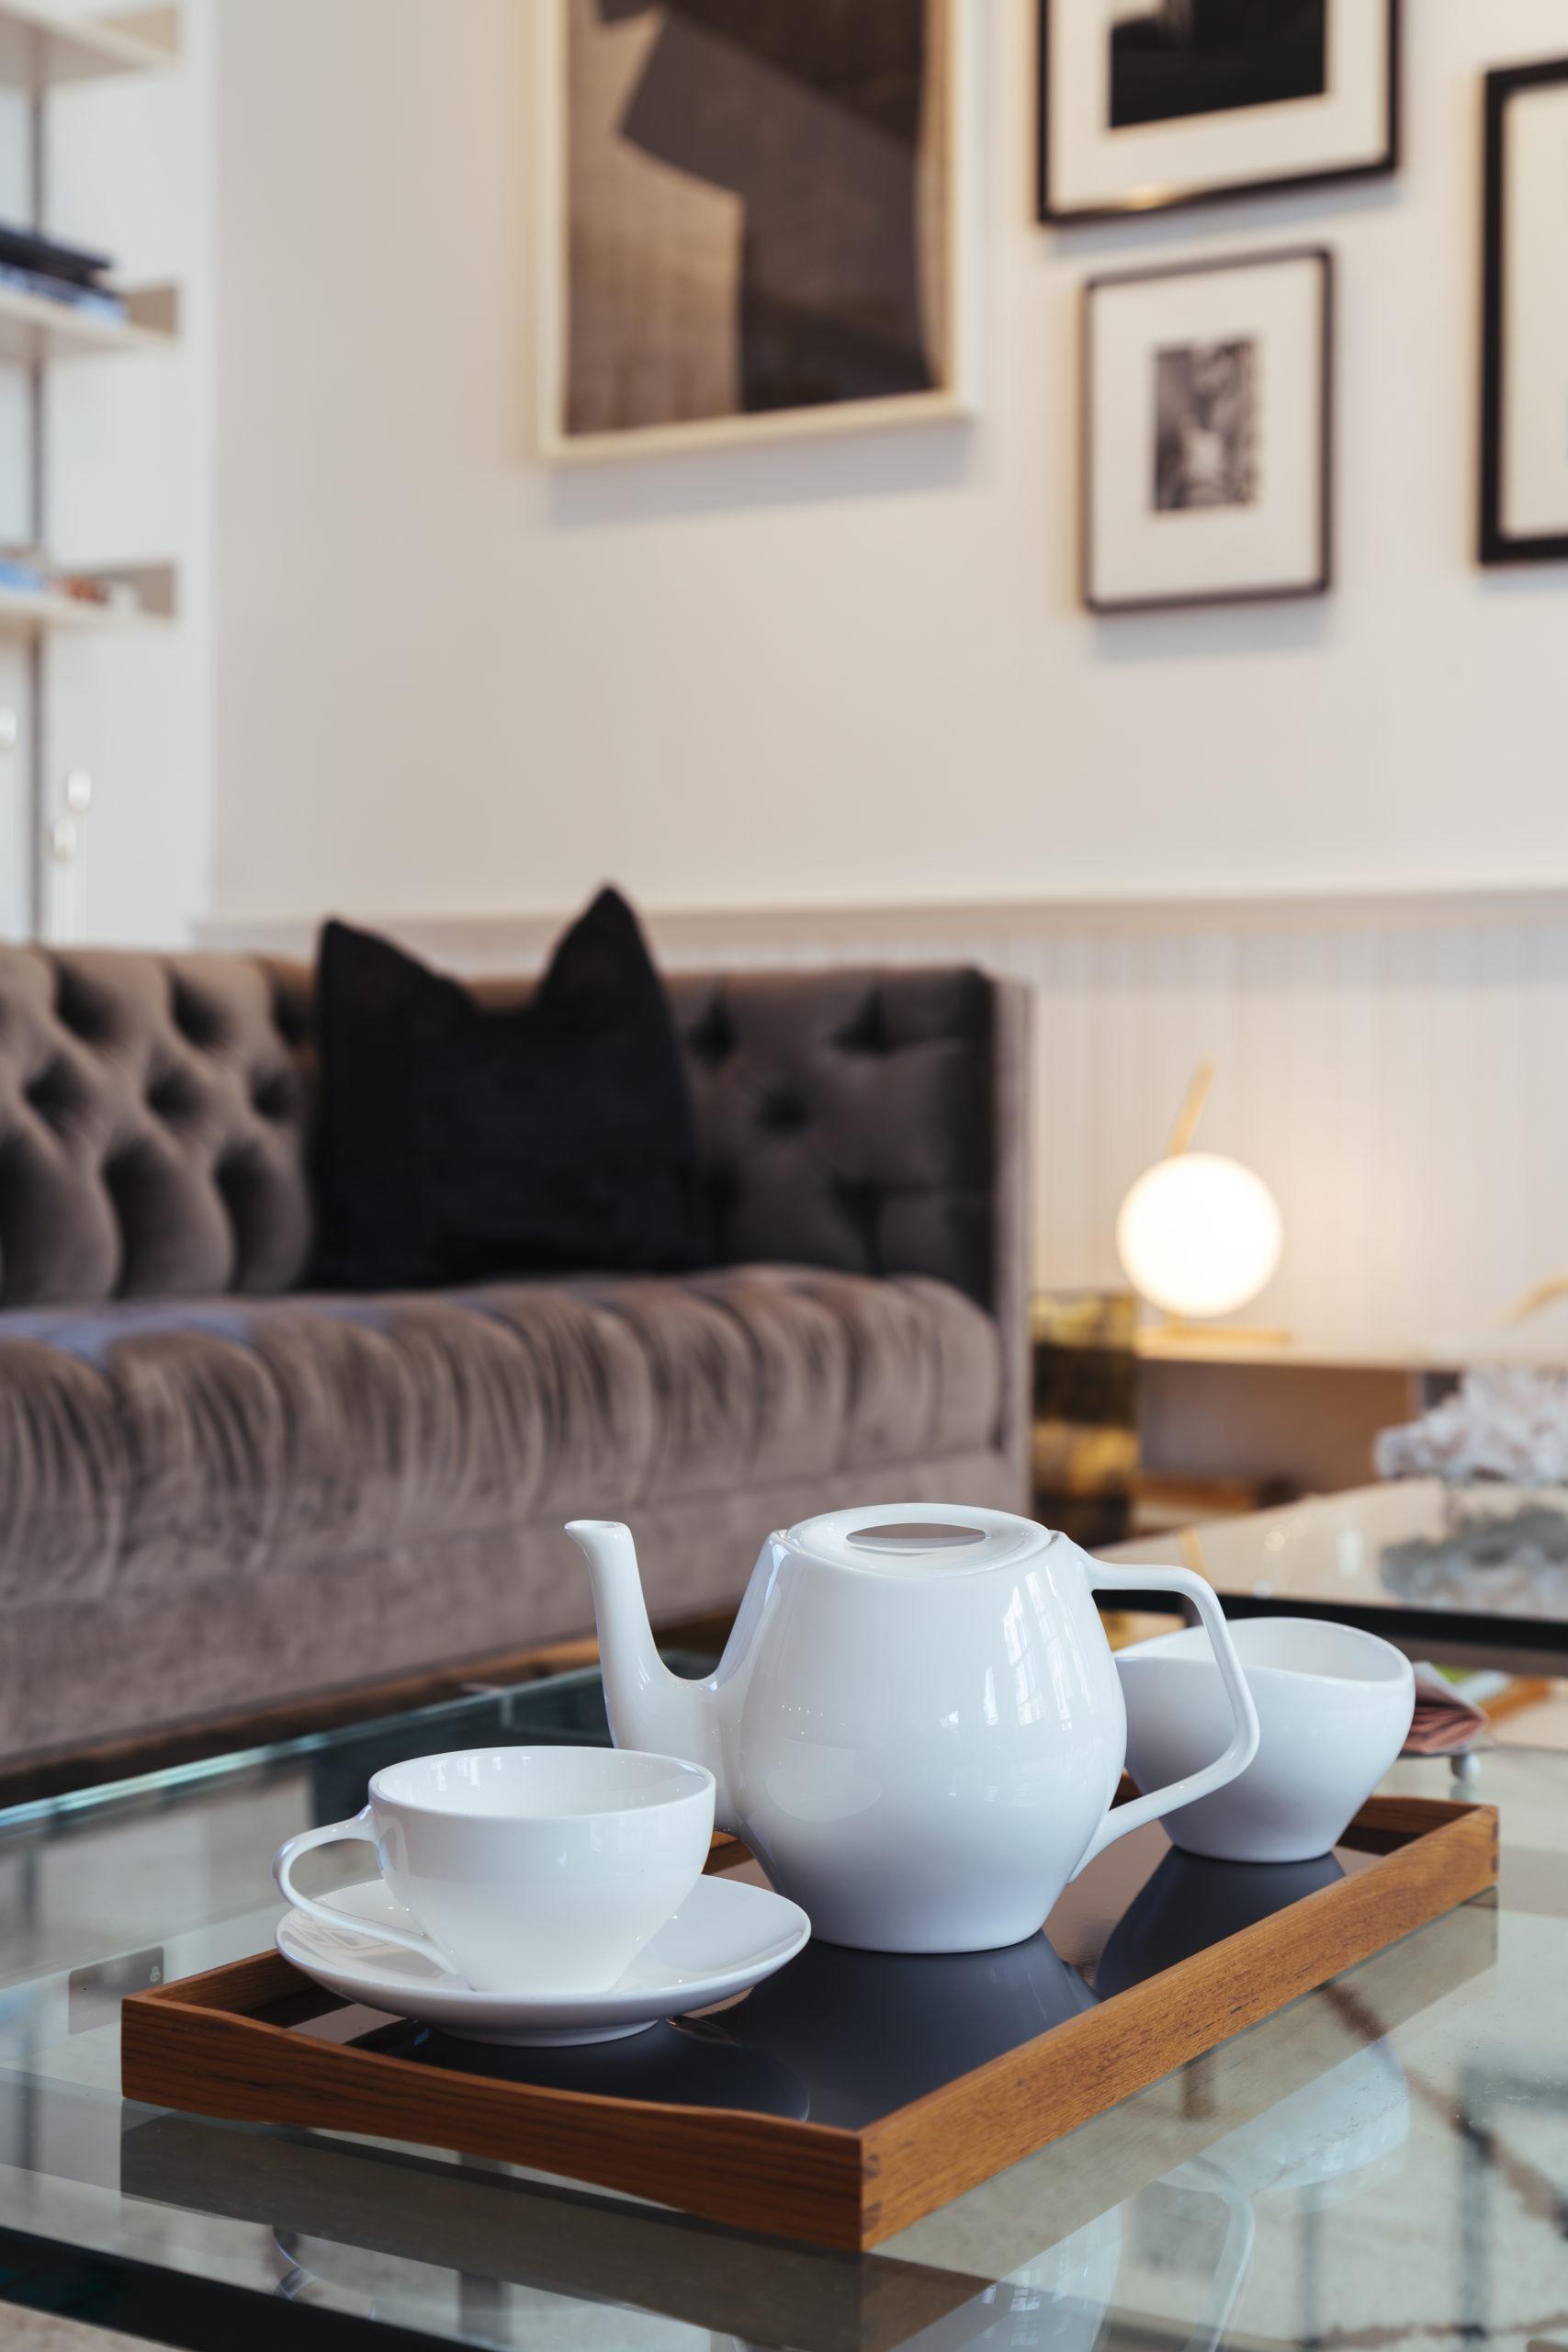 Architectmade-FJ-Essence-Porcelain-Tea-Set-Denmark-Finn-Juhl-6